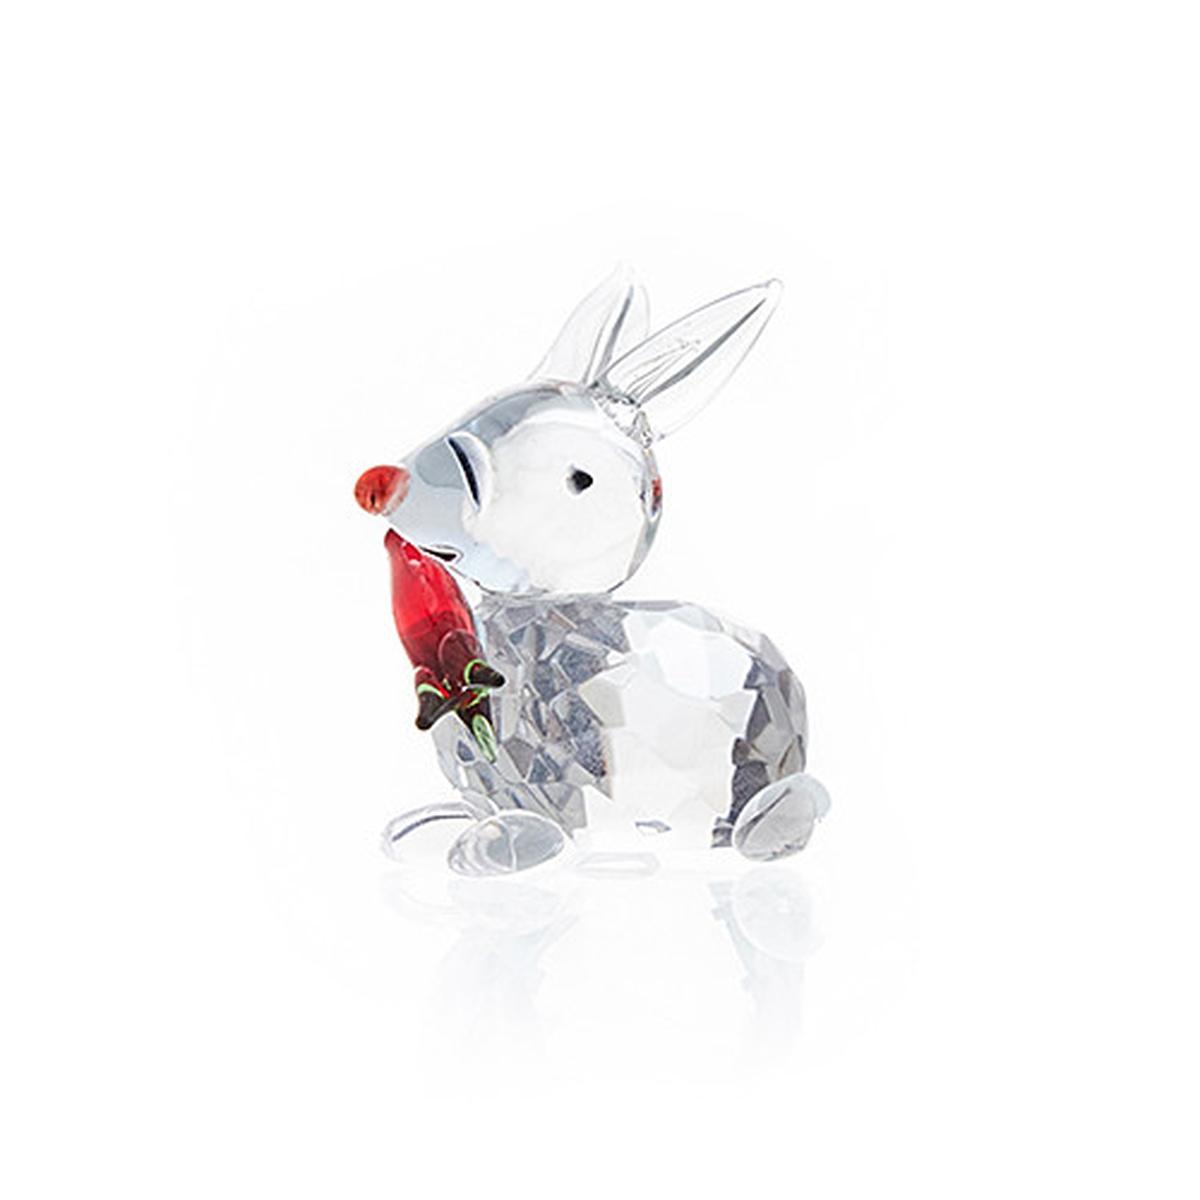 Liten Kanin Krystall